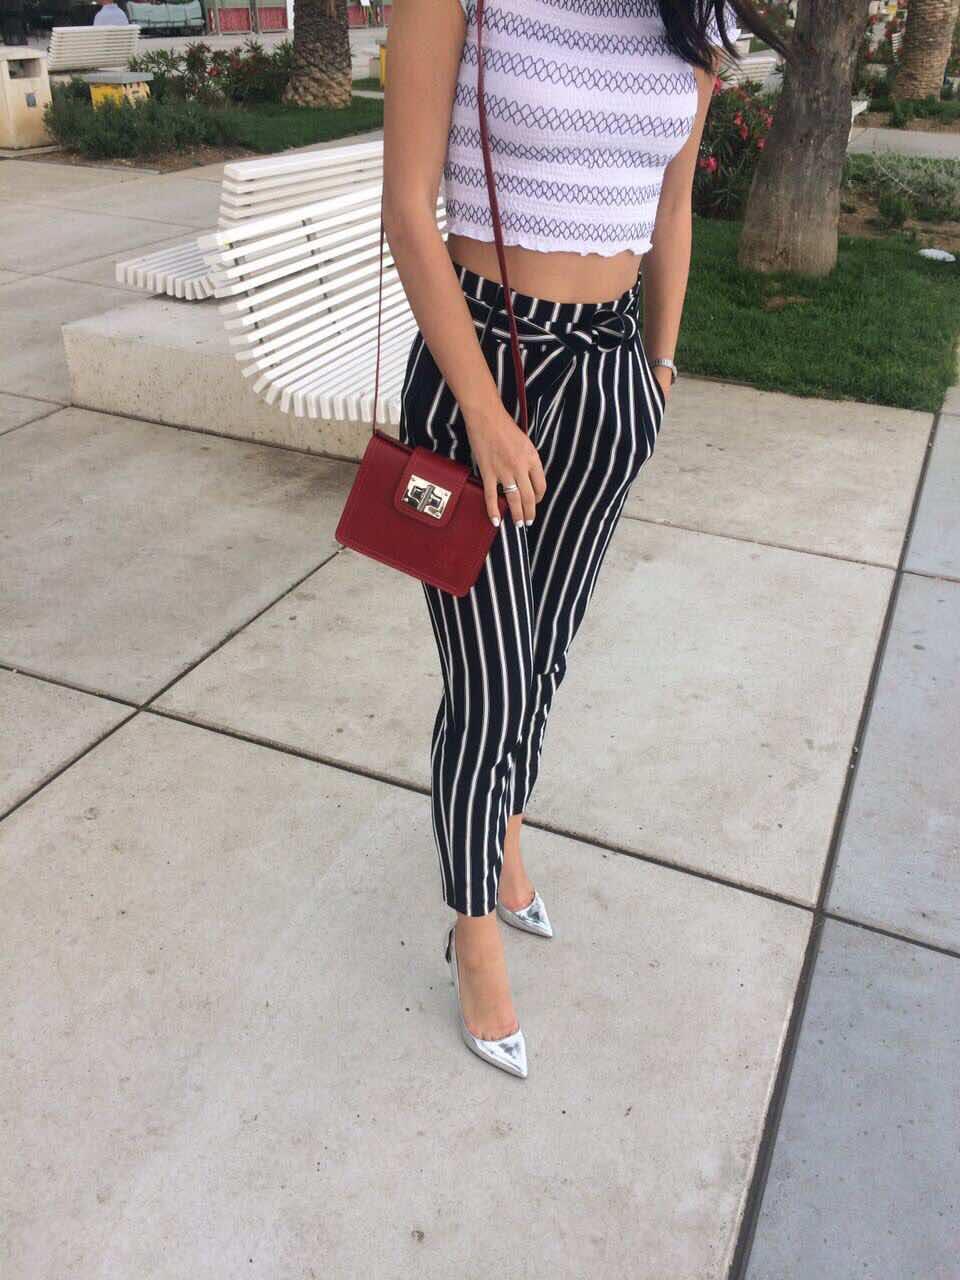 Emily_handbag_15